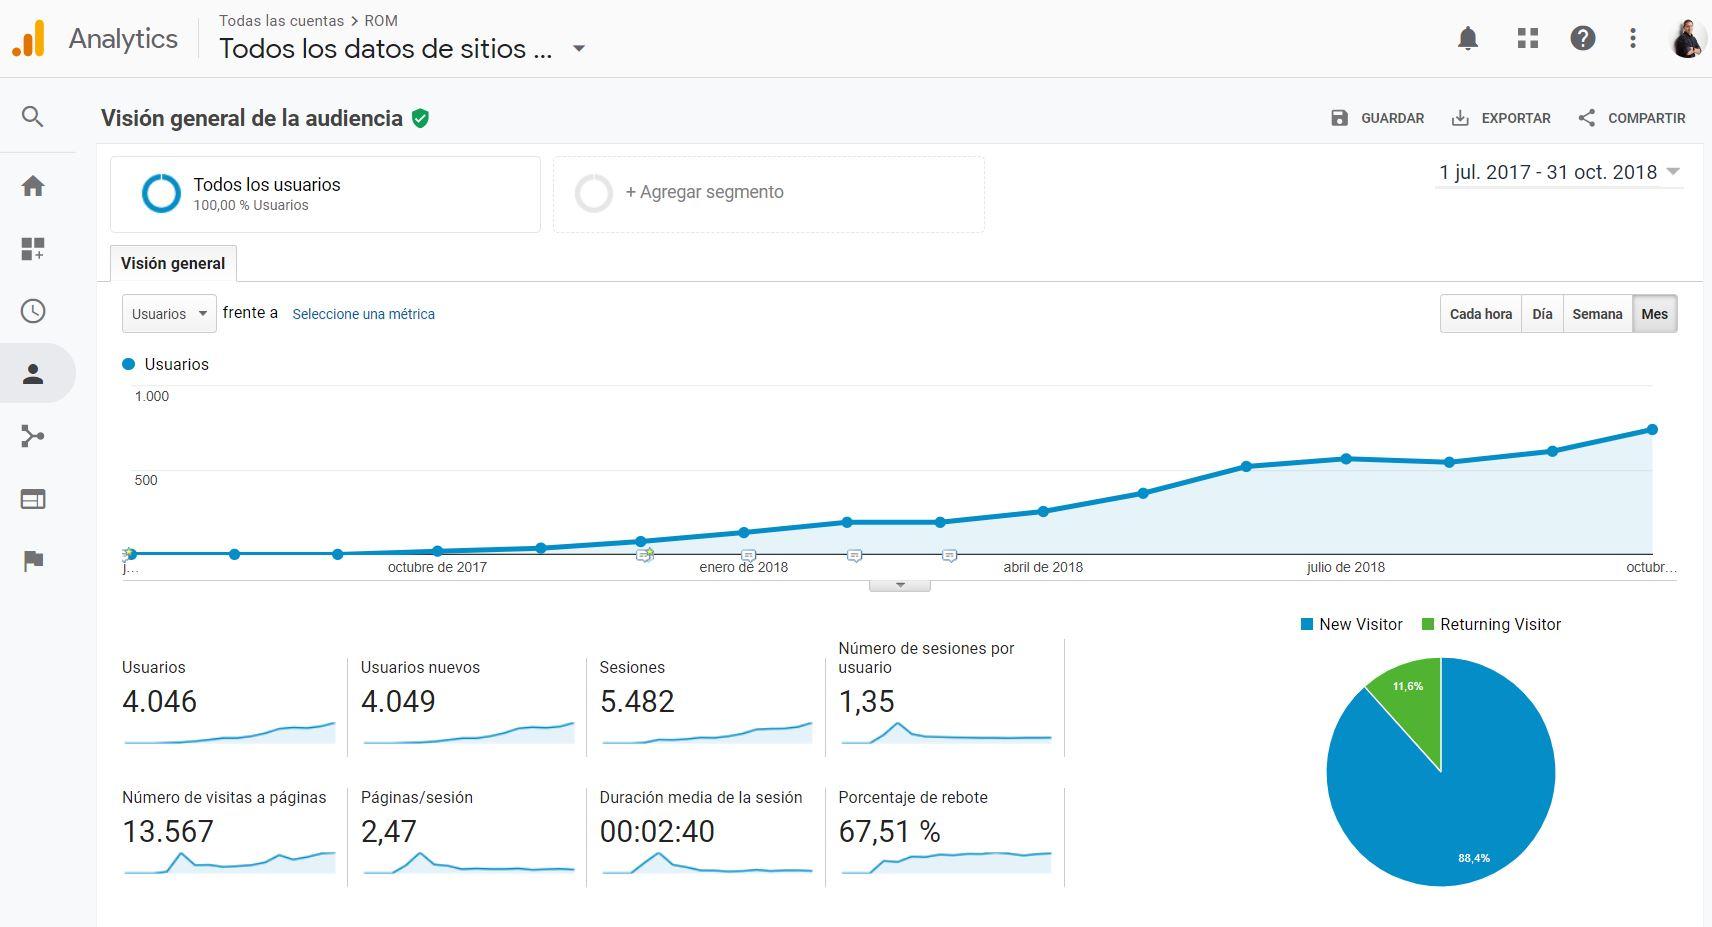 Visitas al website ROM - Google Analytics